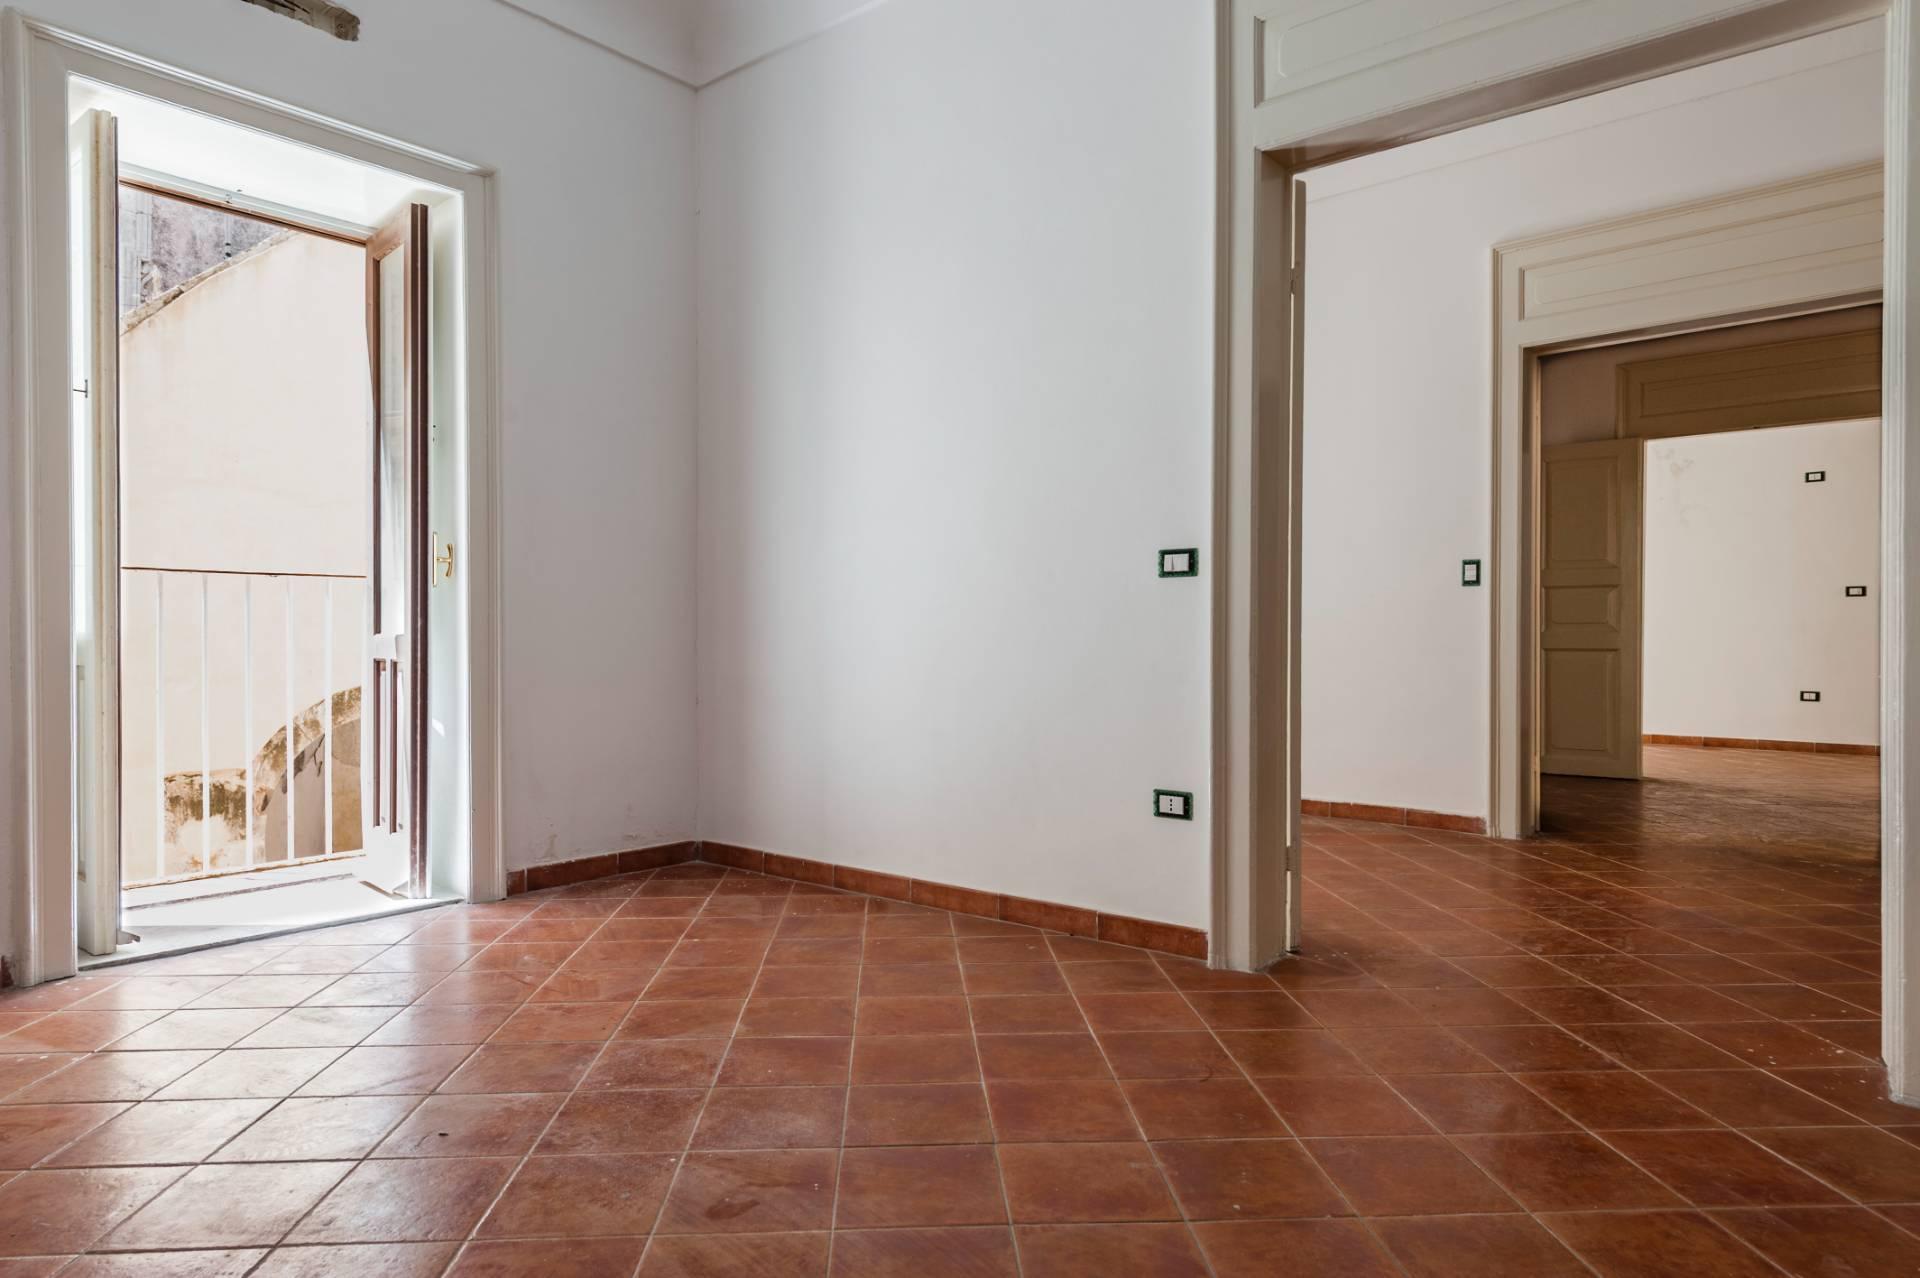 Palazzo in Vendita a Siracusa: 5 locali, 500 mq - Foto 13